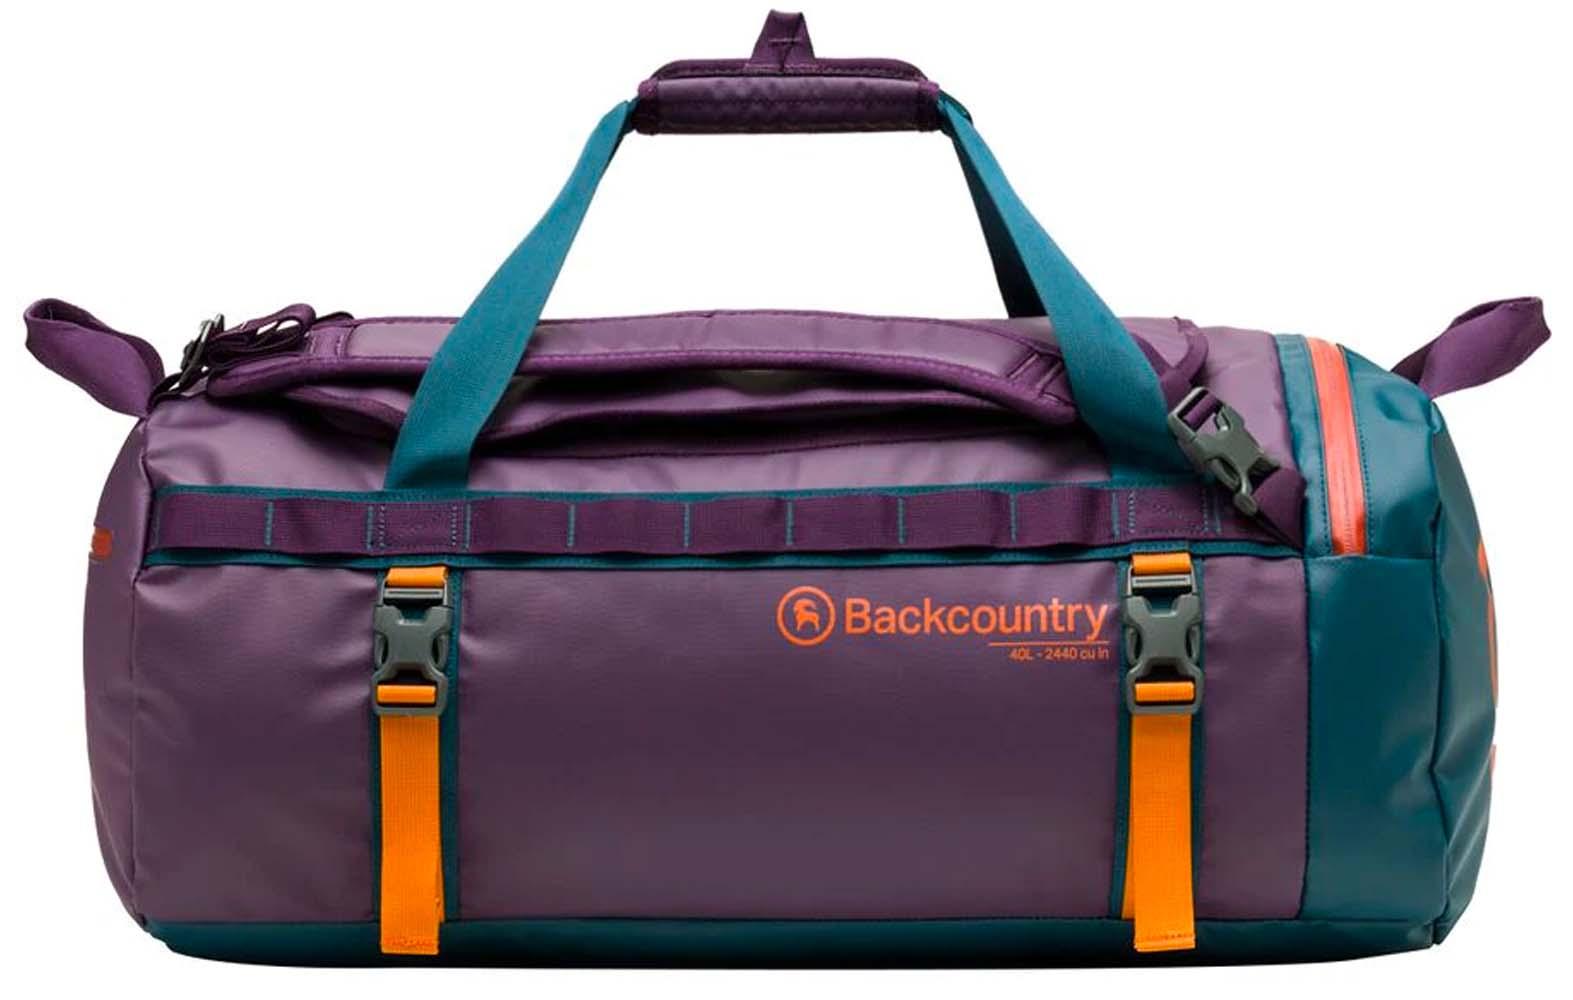 backcountry all around duffel